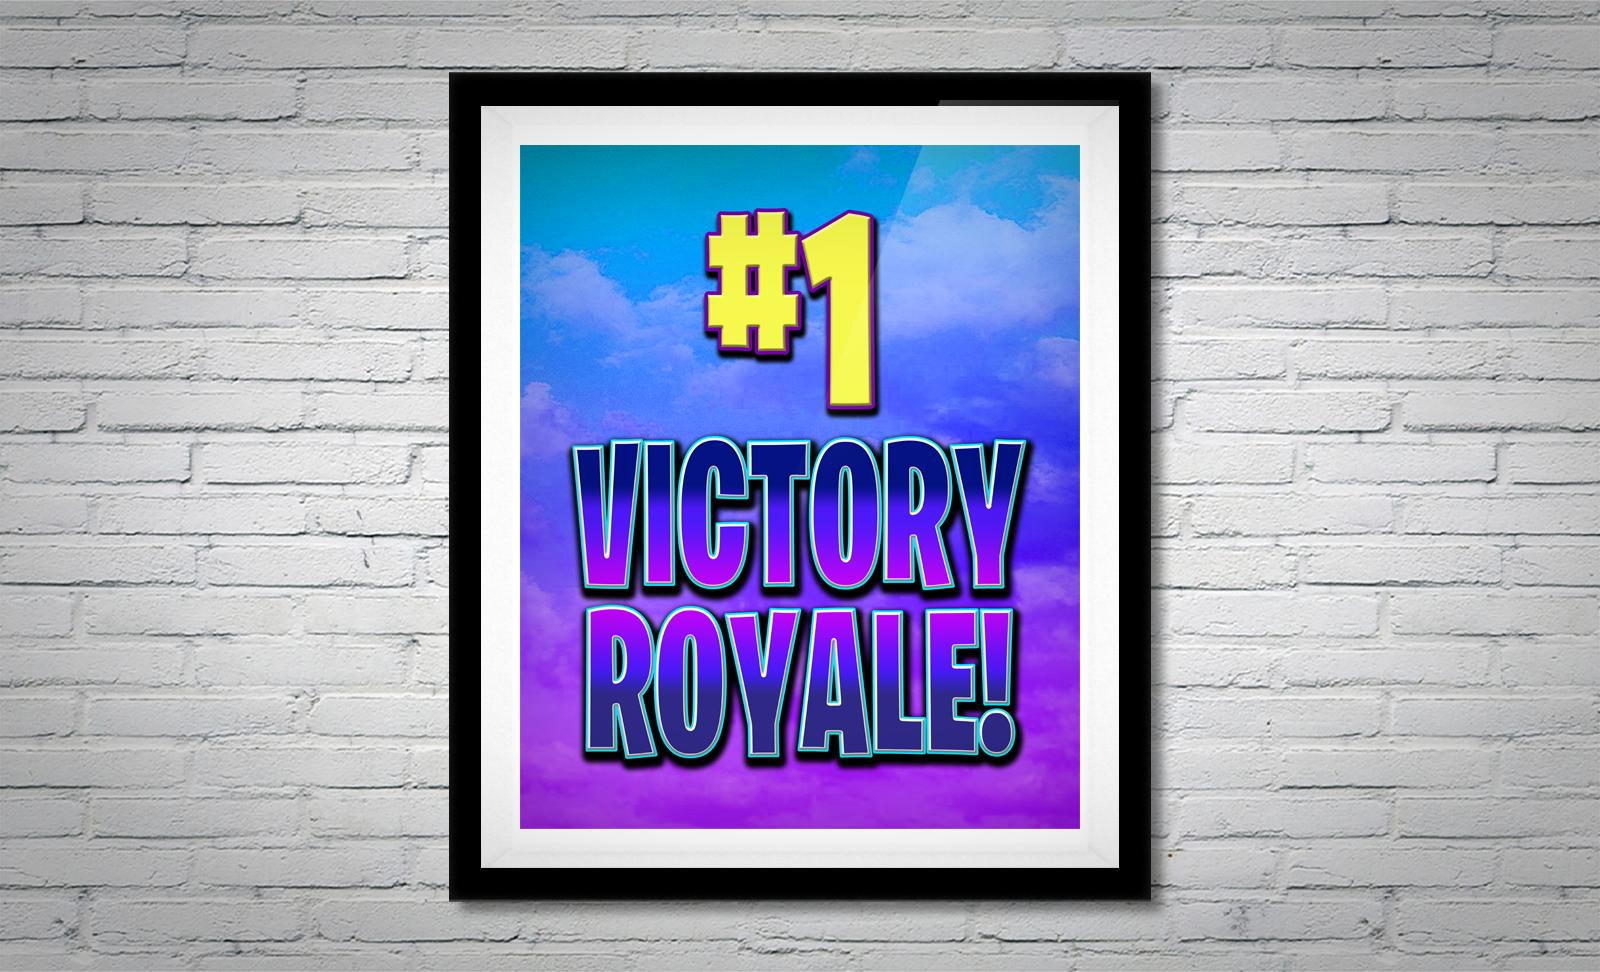 Fortnite Victory Royale Gamer Sign 8x10 Or 16x20 Digital File Gamer Decor Gamer Room Red Wall Art